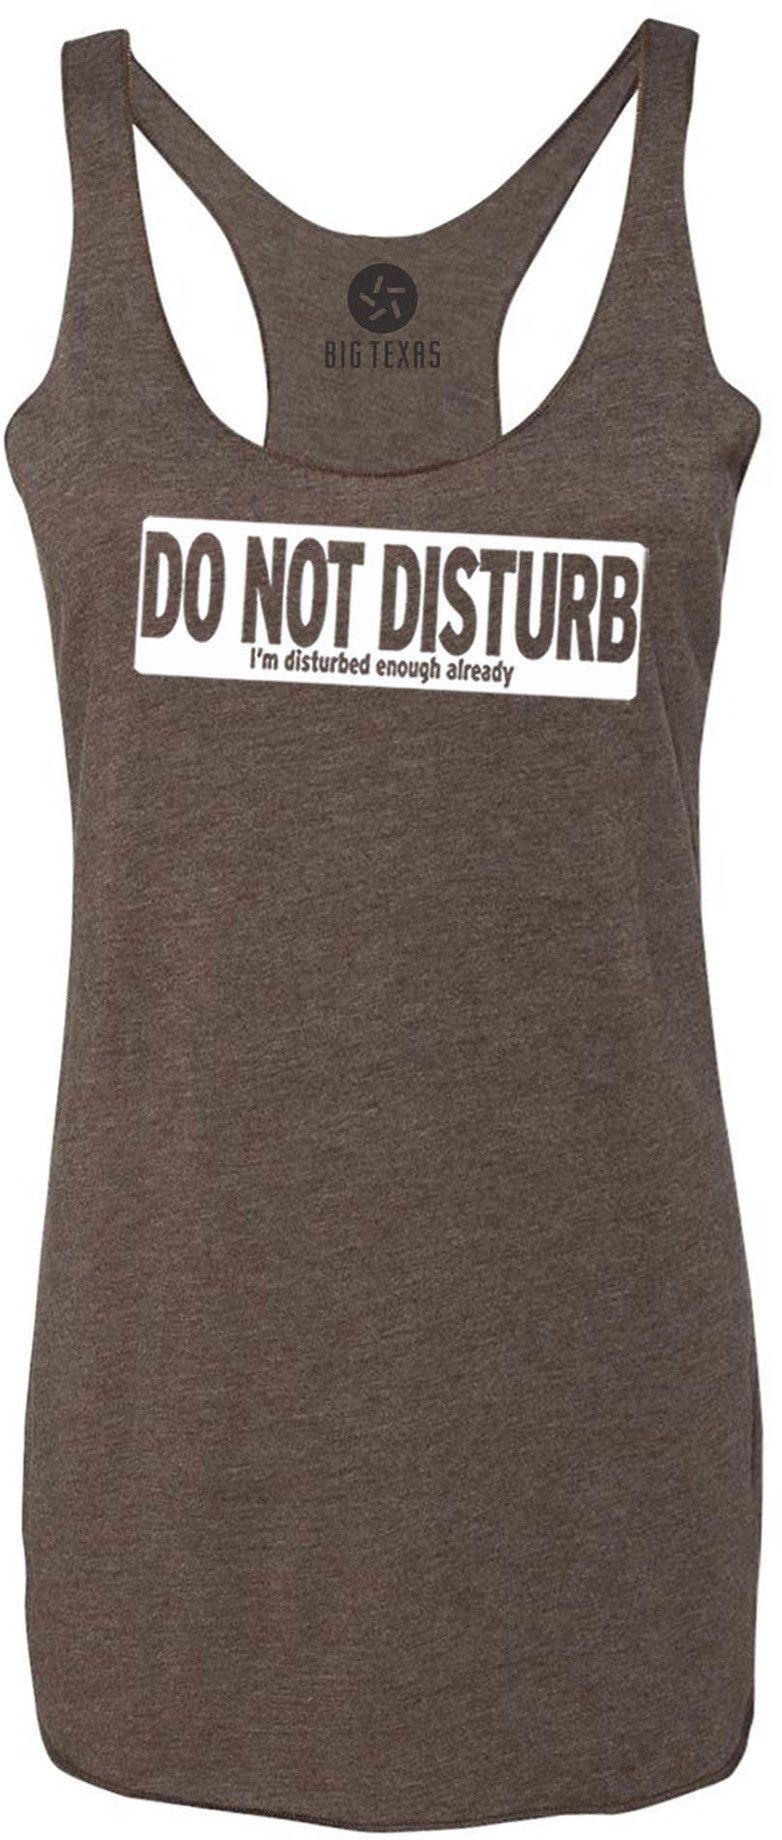 Do Not Disturb (White) TriBlend Racerback TankTop